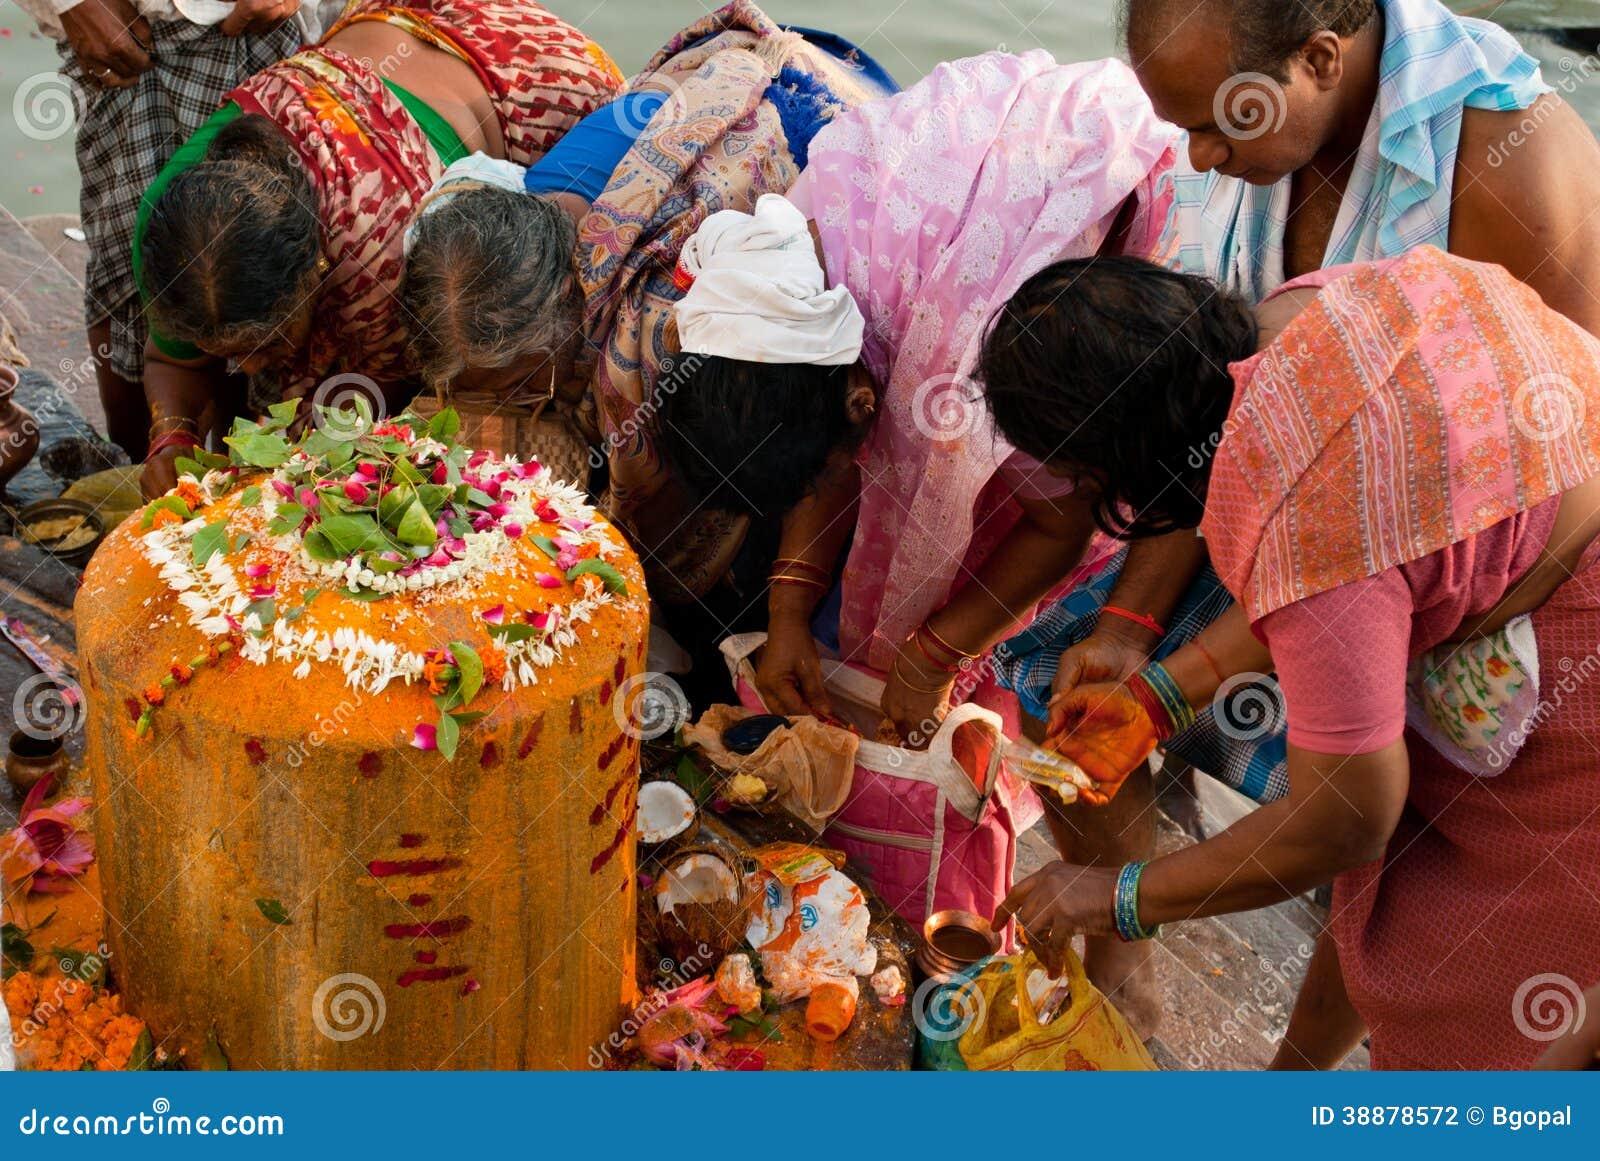 Hindu penis image